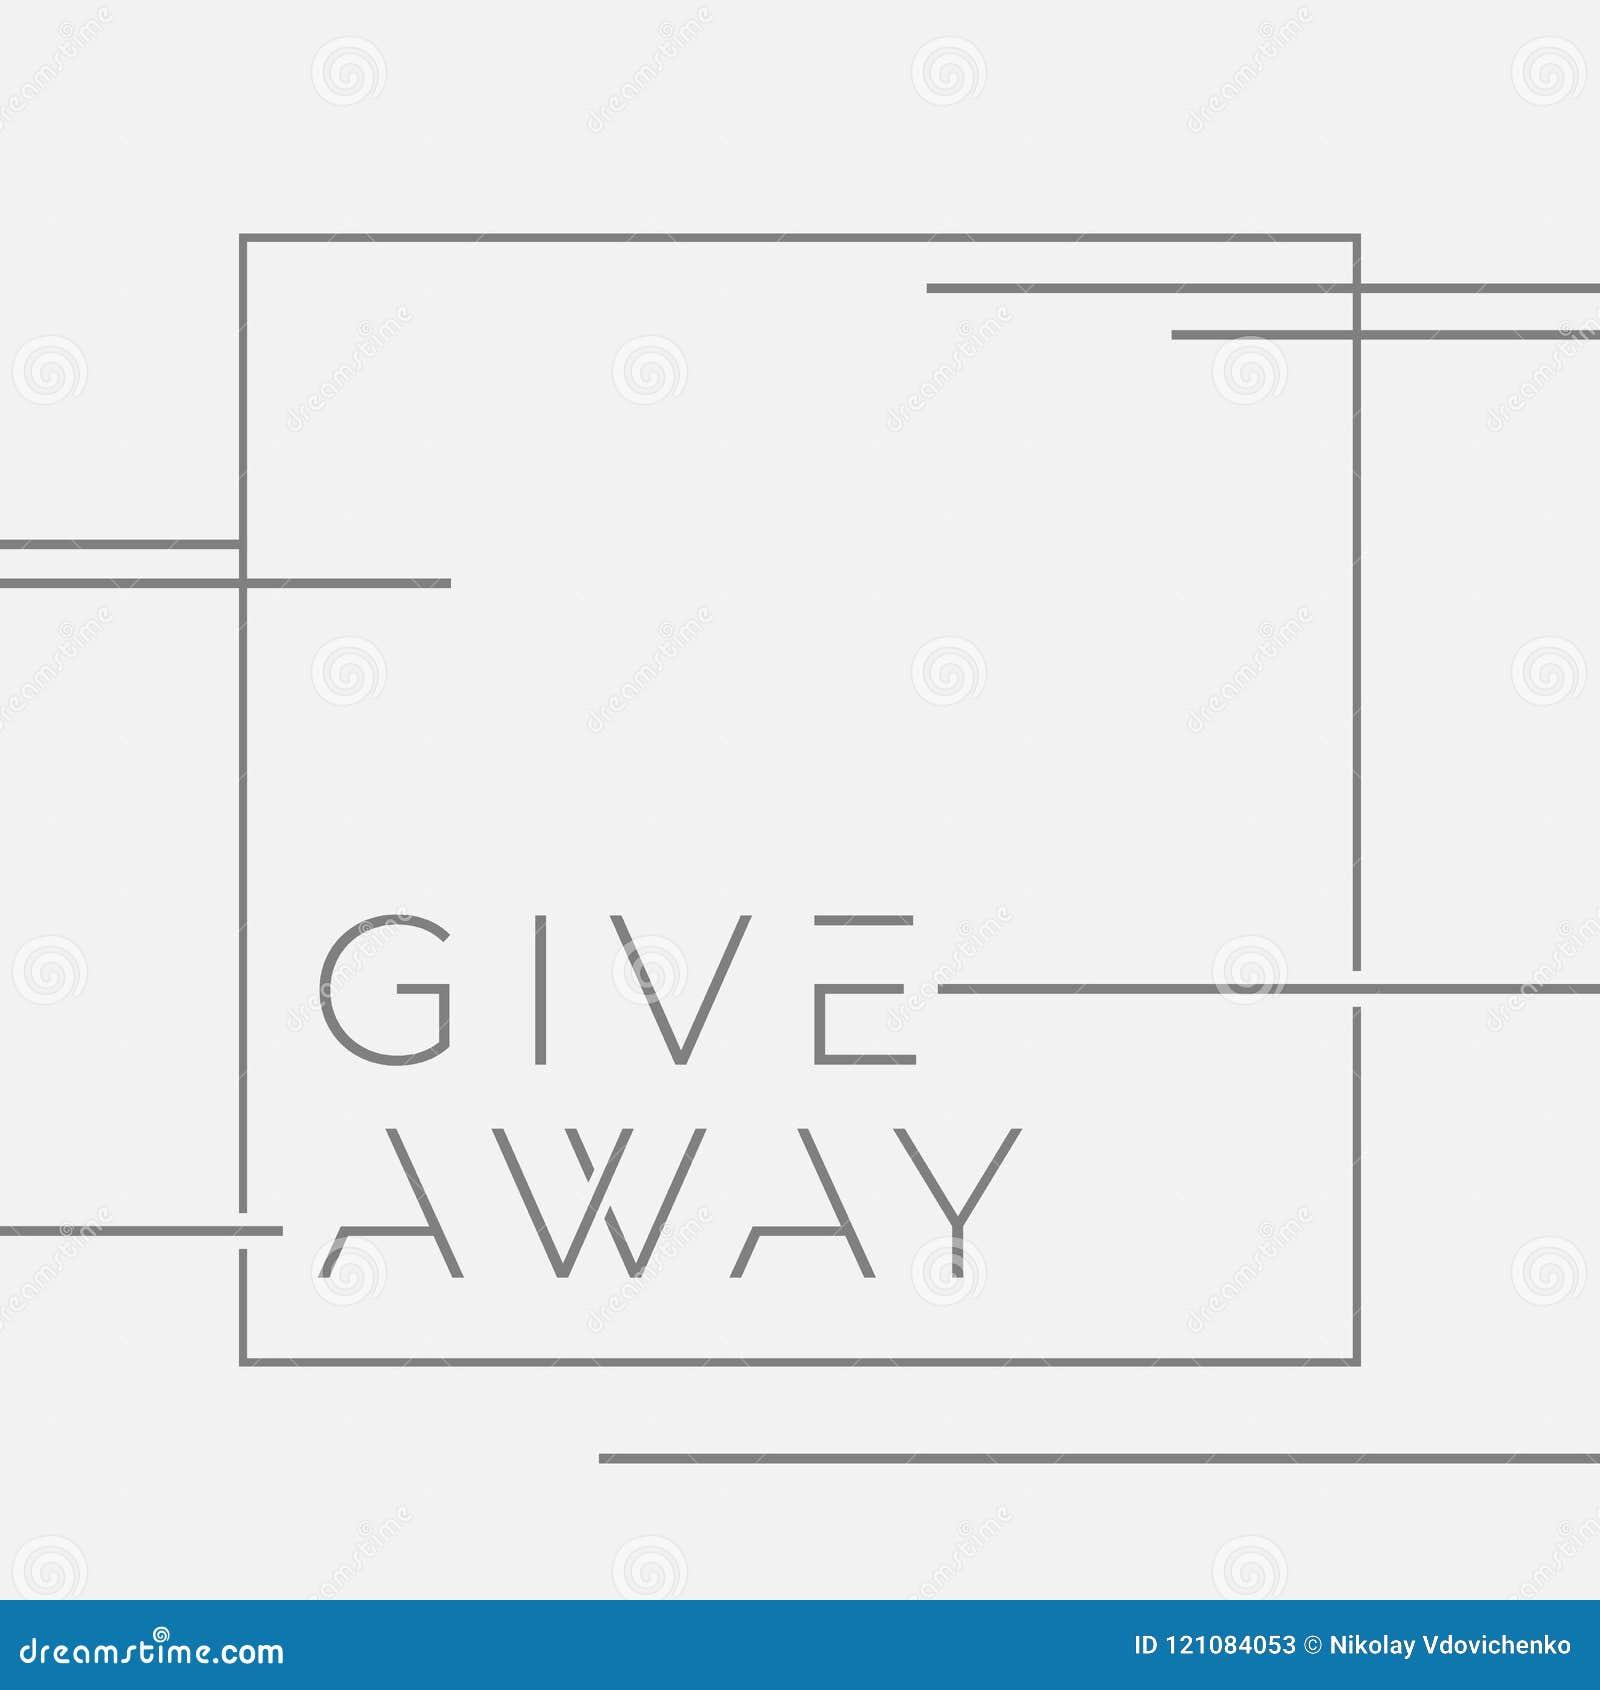 GIVEAWAY έμβλημα για τους διαγωνισμούς στα κοινωνικά μέσα Διανυσματική απεικόνιση με τις γραφικές γραμμές στο απομονωμένο υπόβαθρ